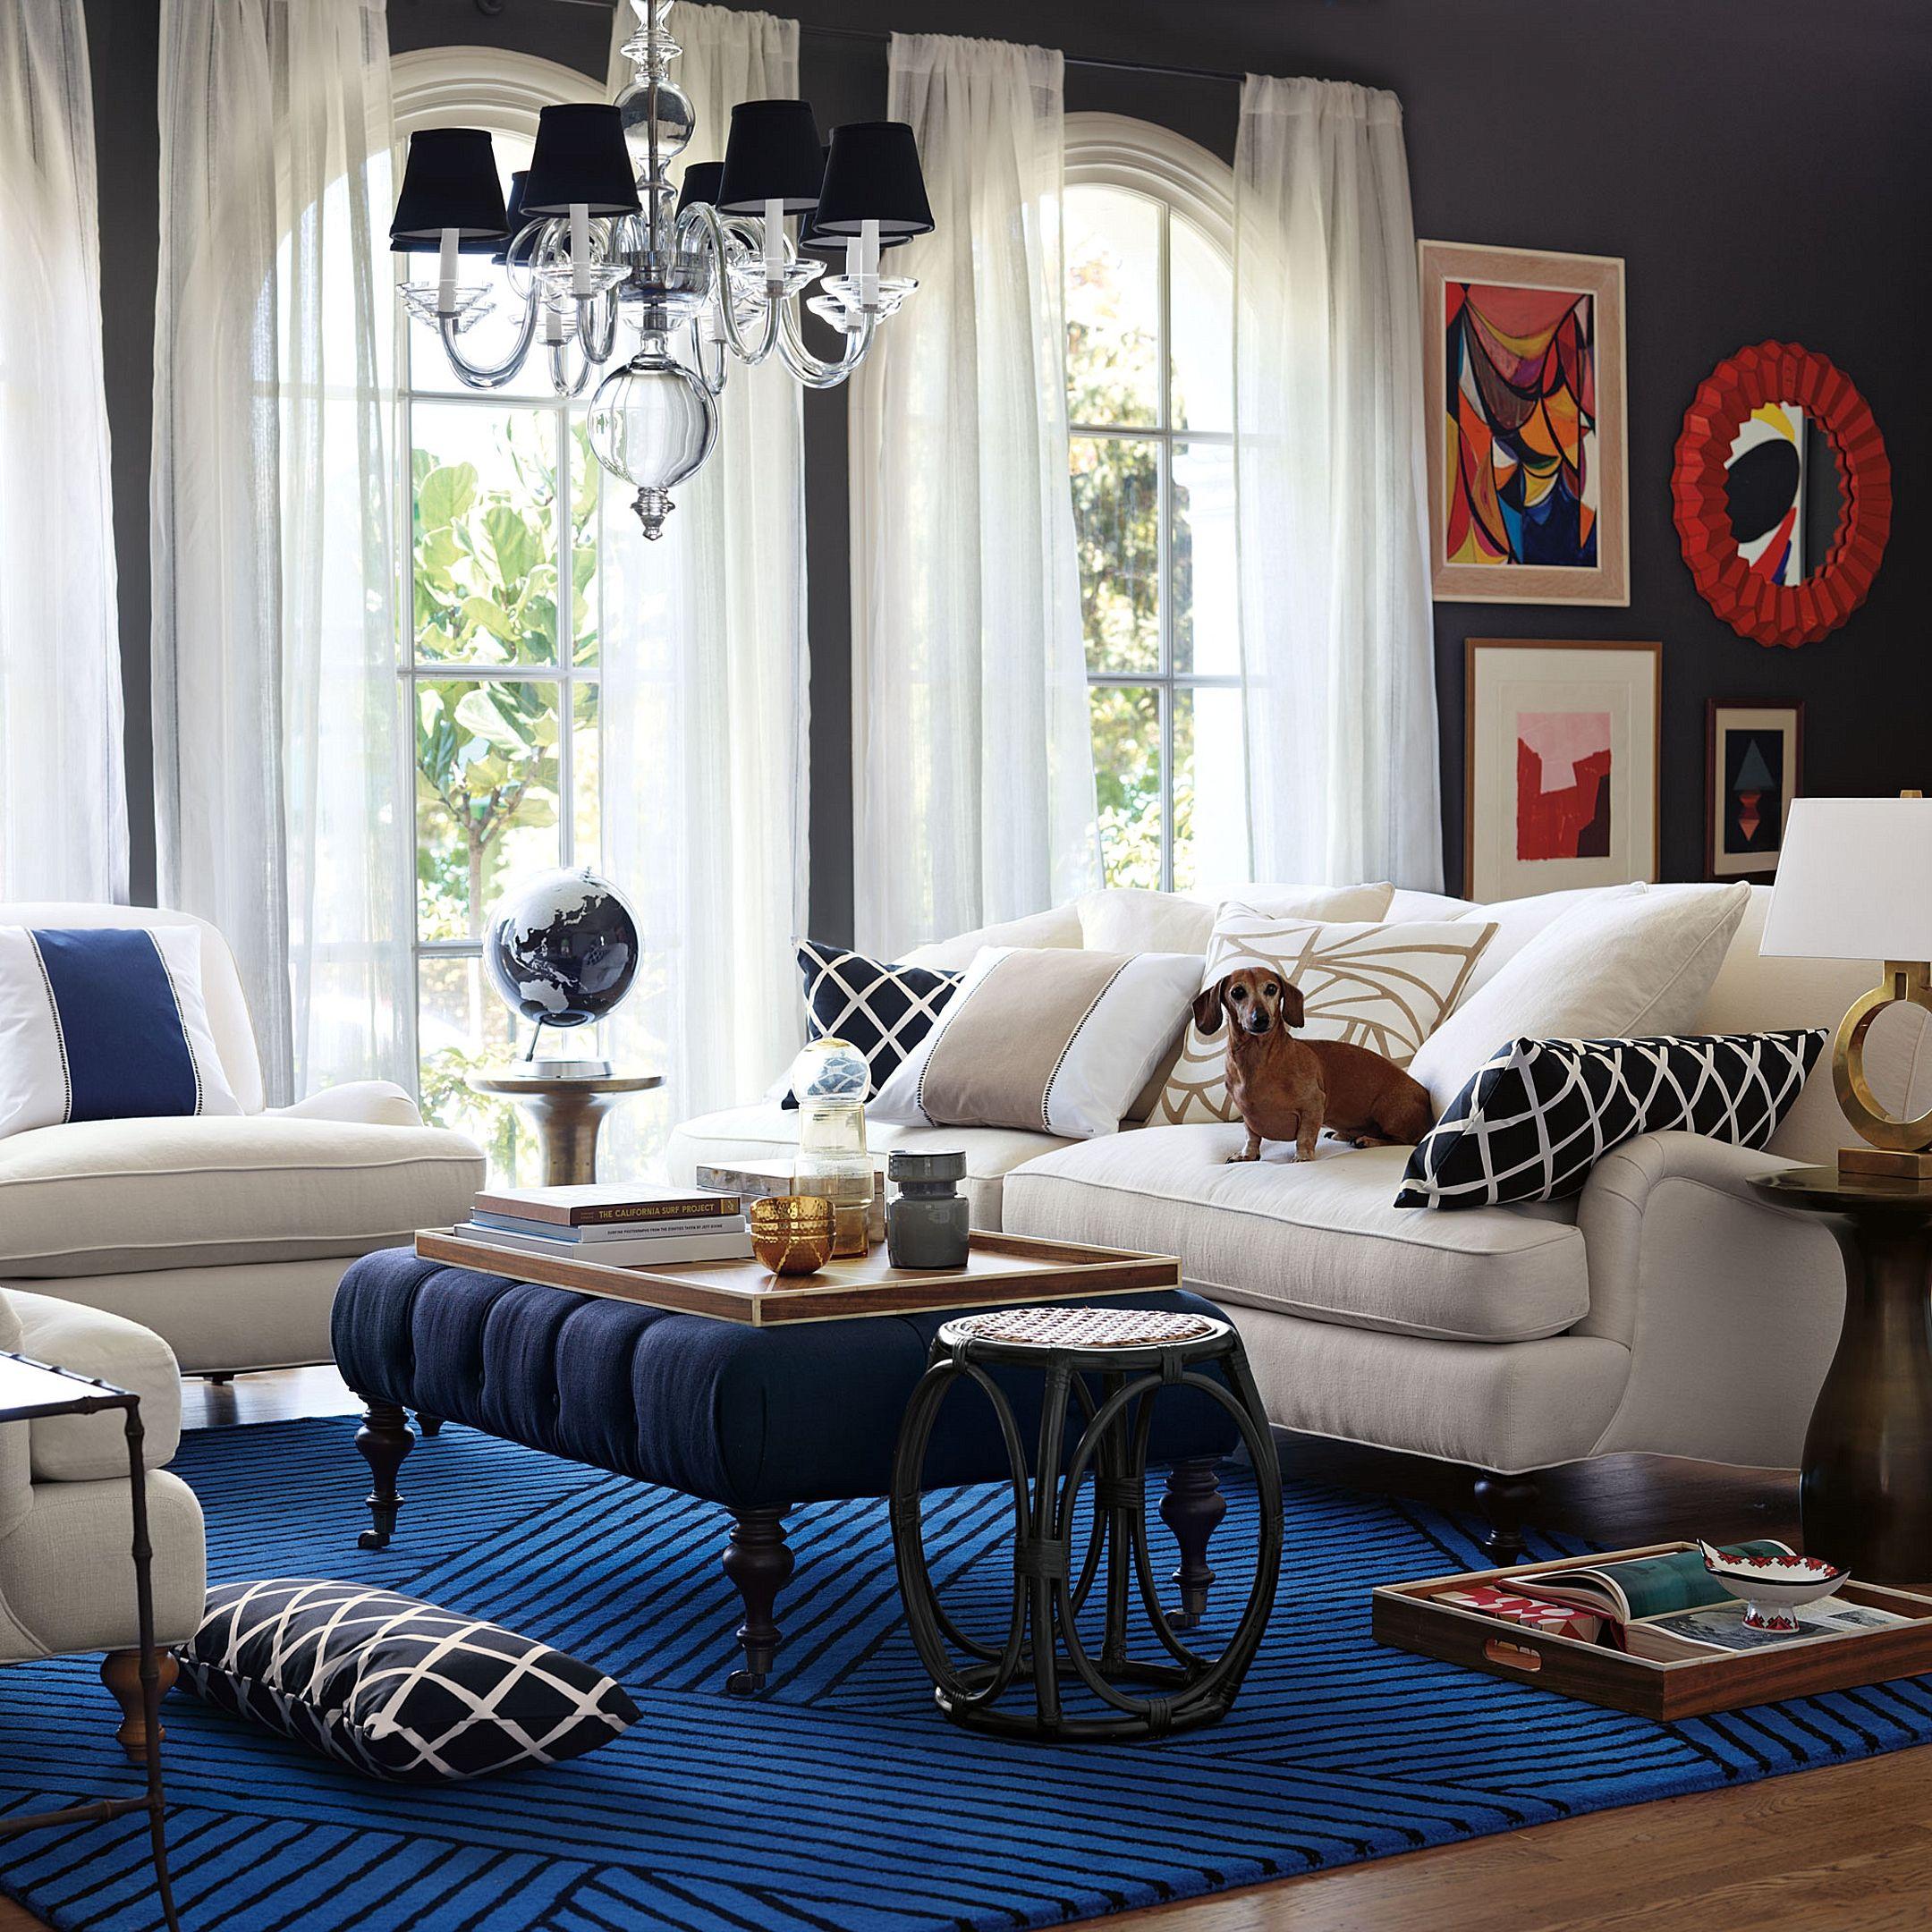 Best Cobalt And Black Serenaandlily Furniture Design Living 640 x 480